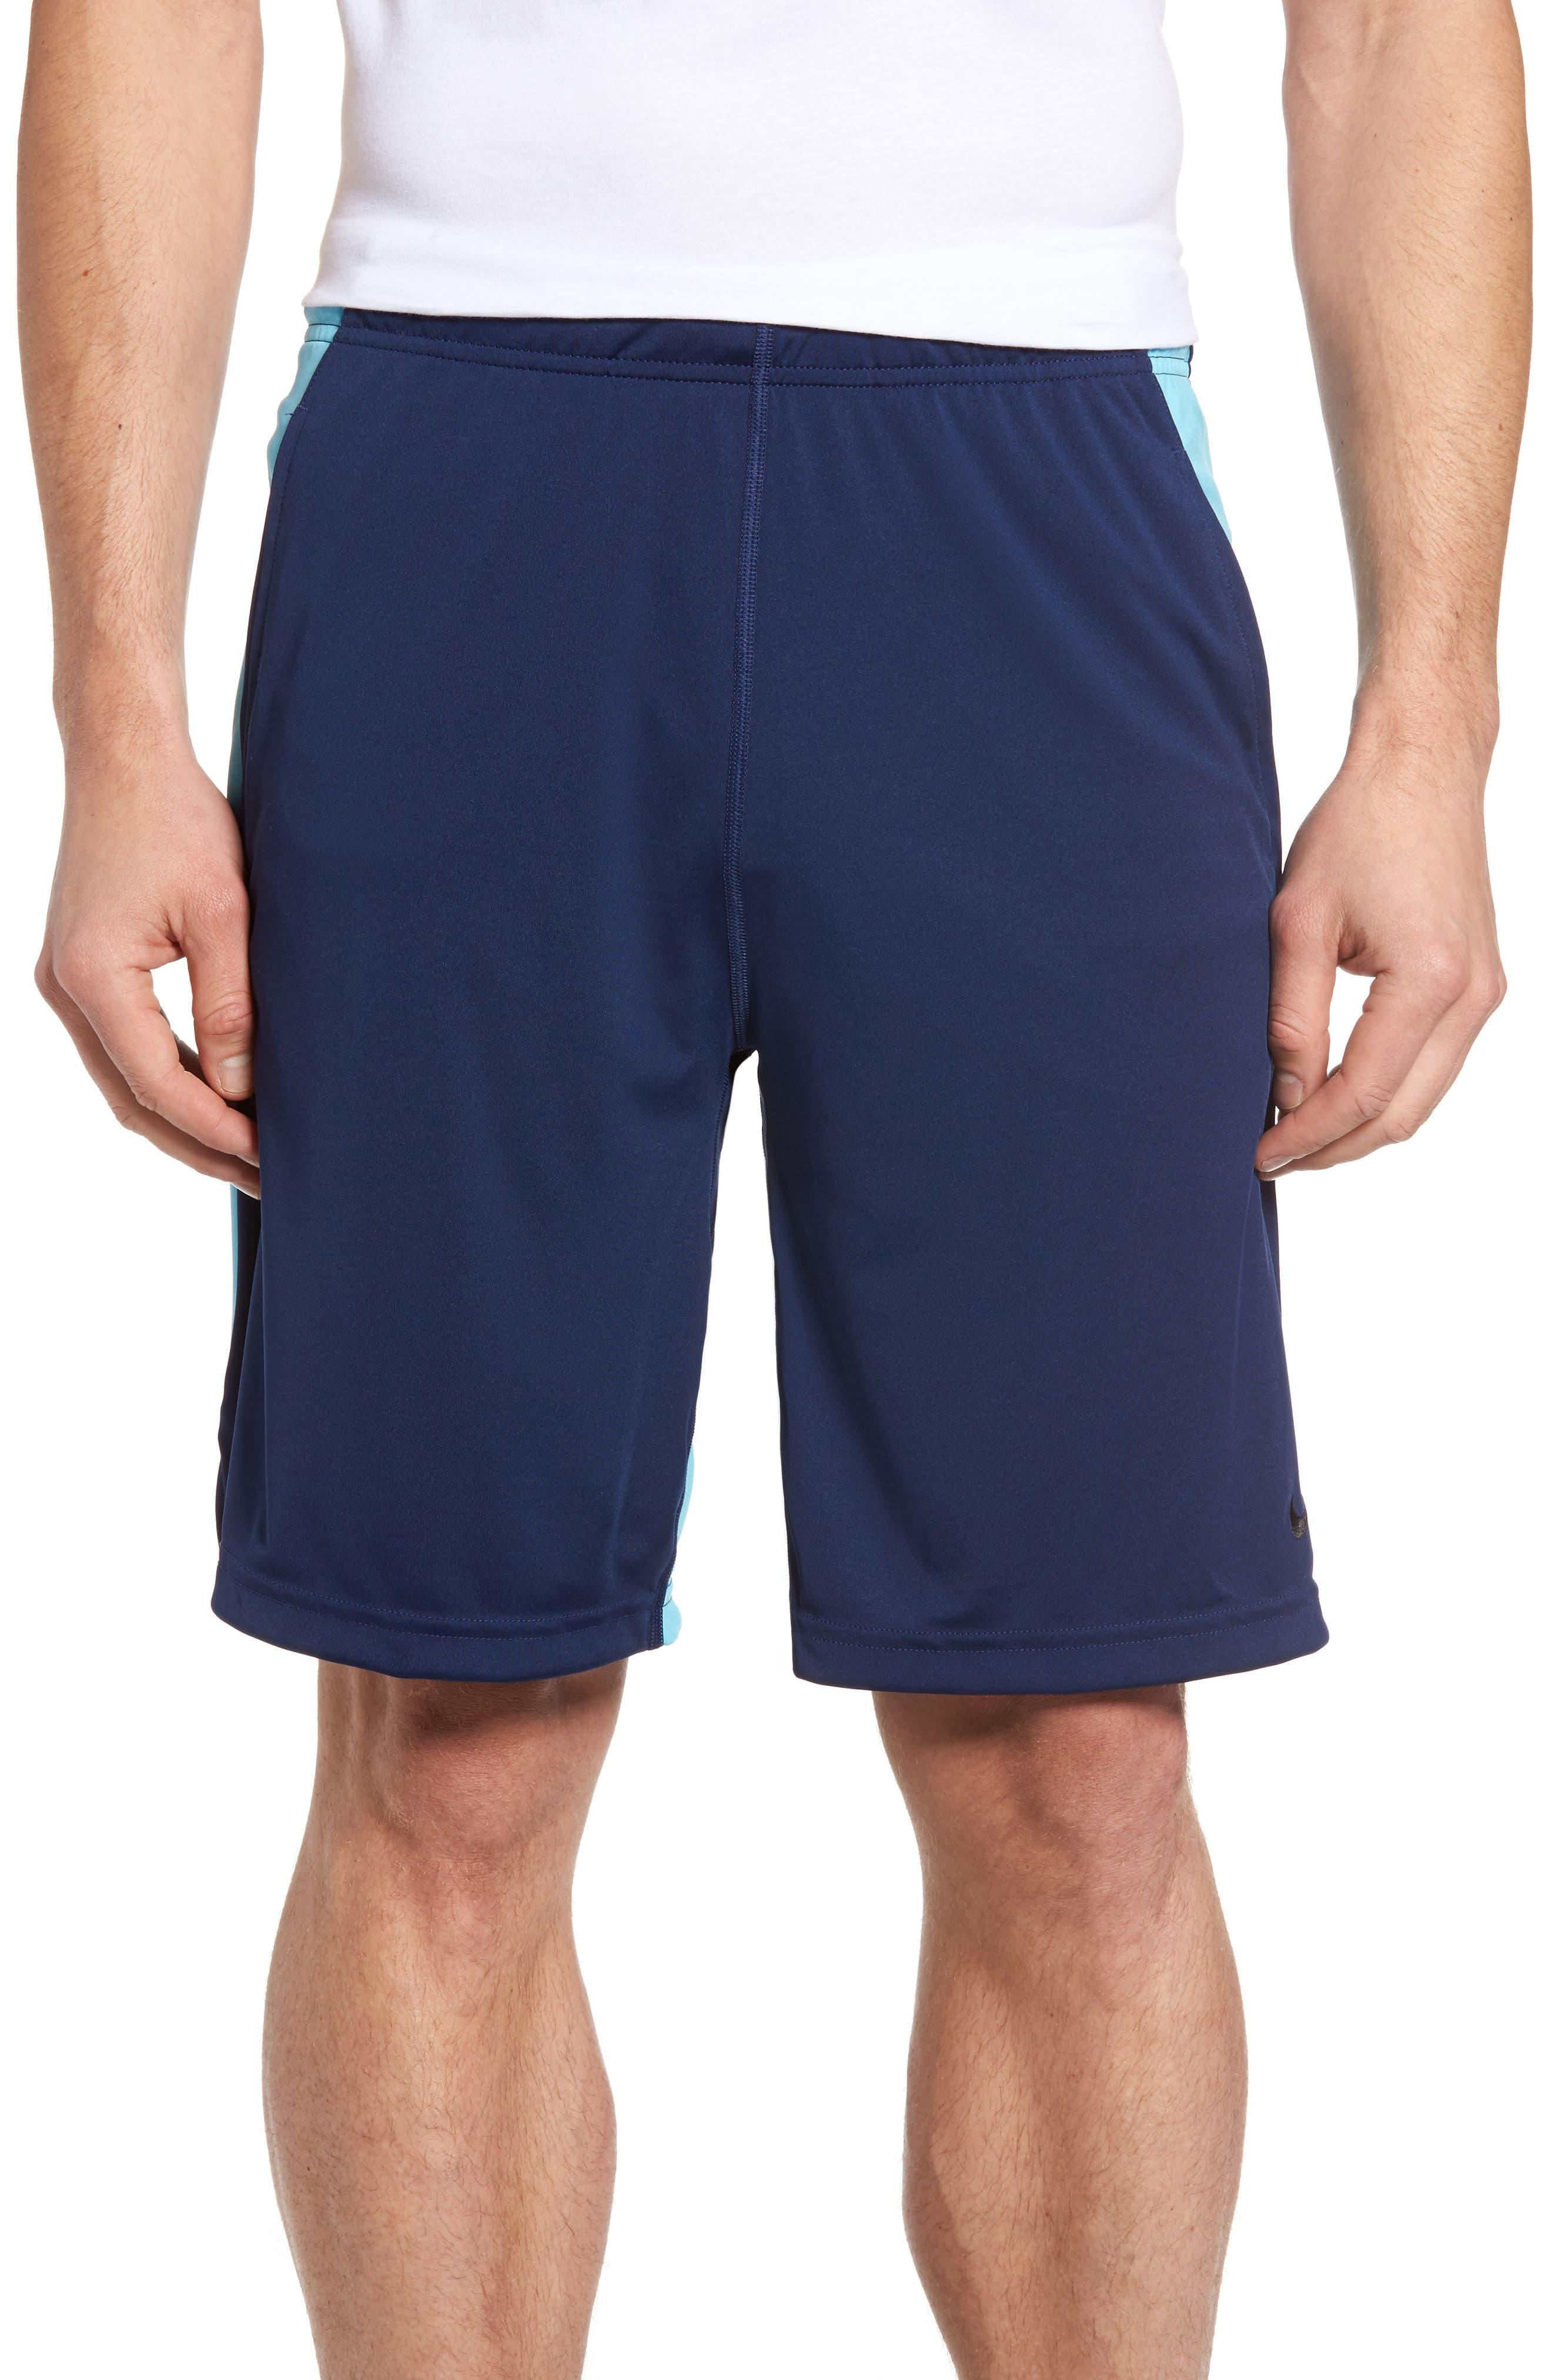 Alternate Image 1 Selected - Nike 'Fly' Dri-FIT Training Shorts